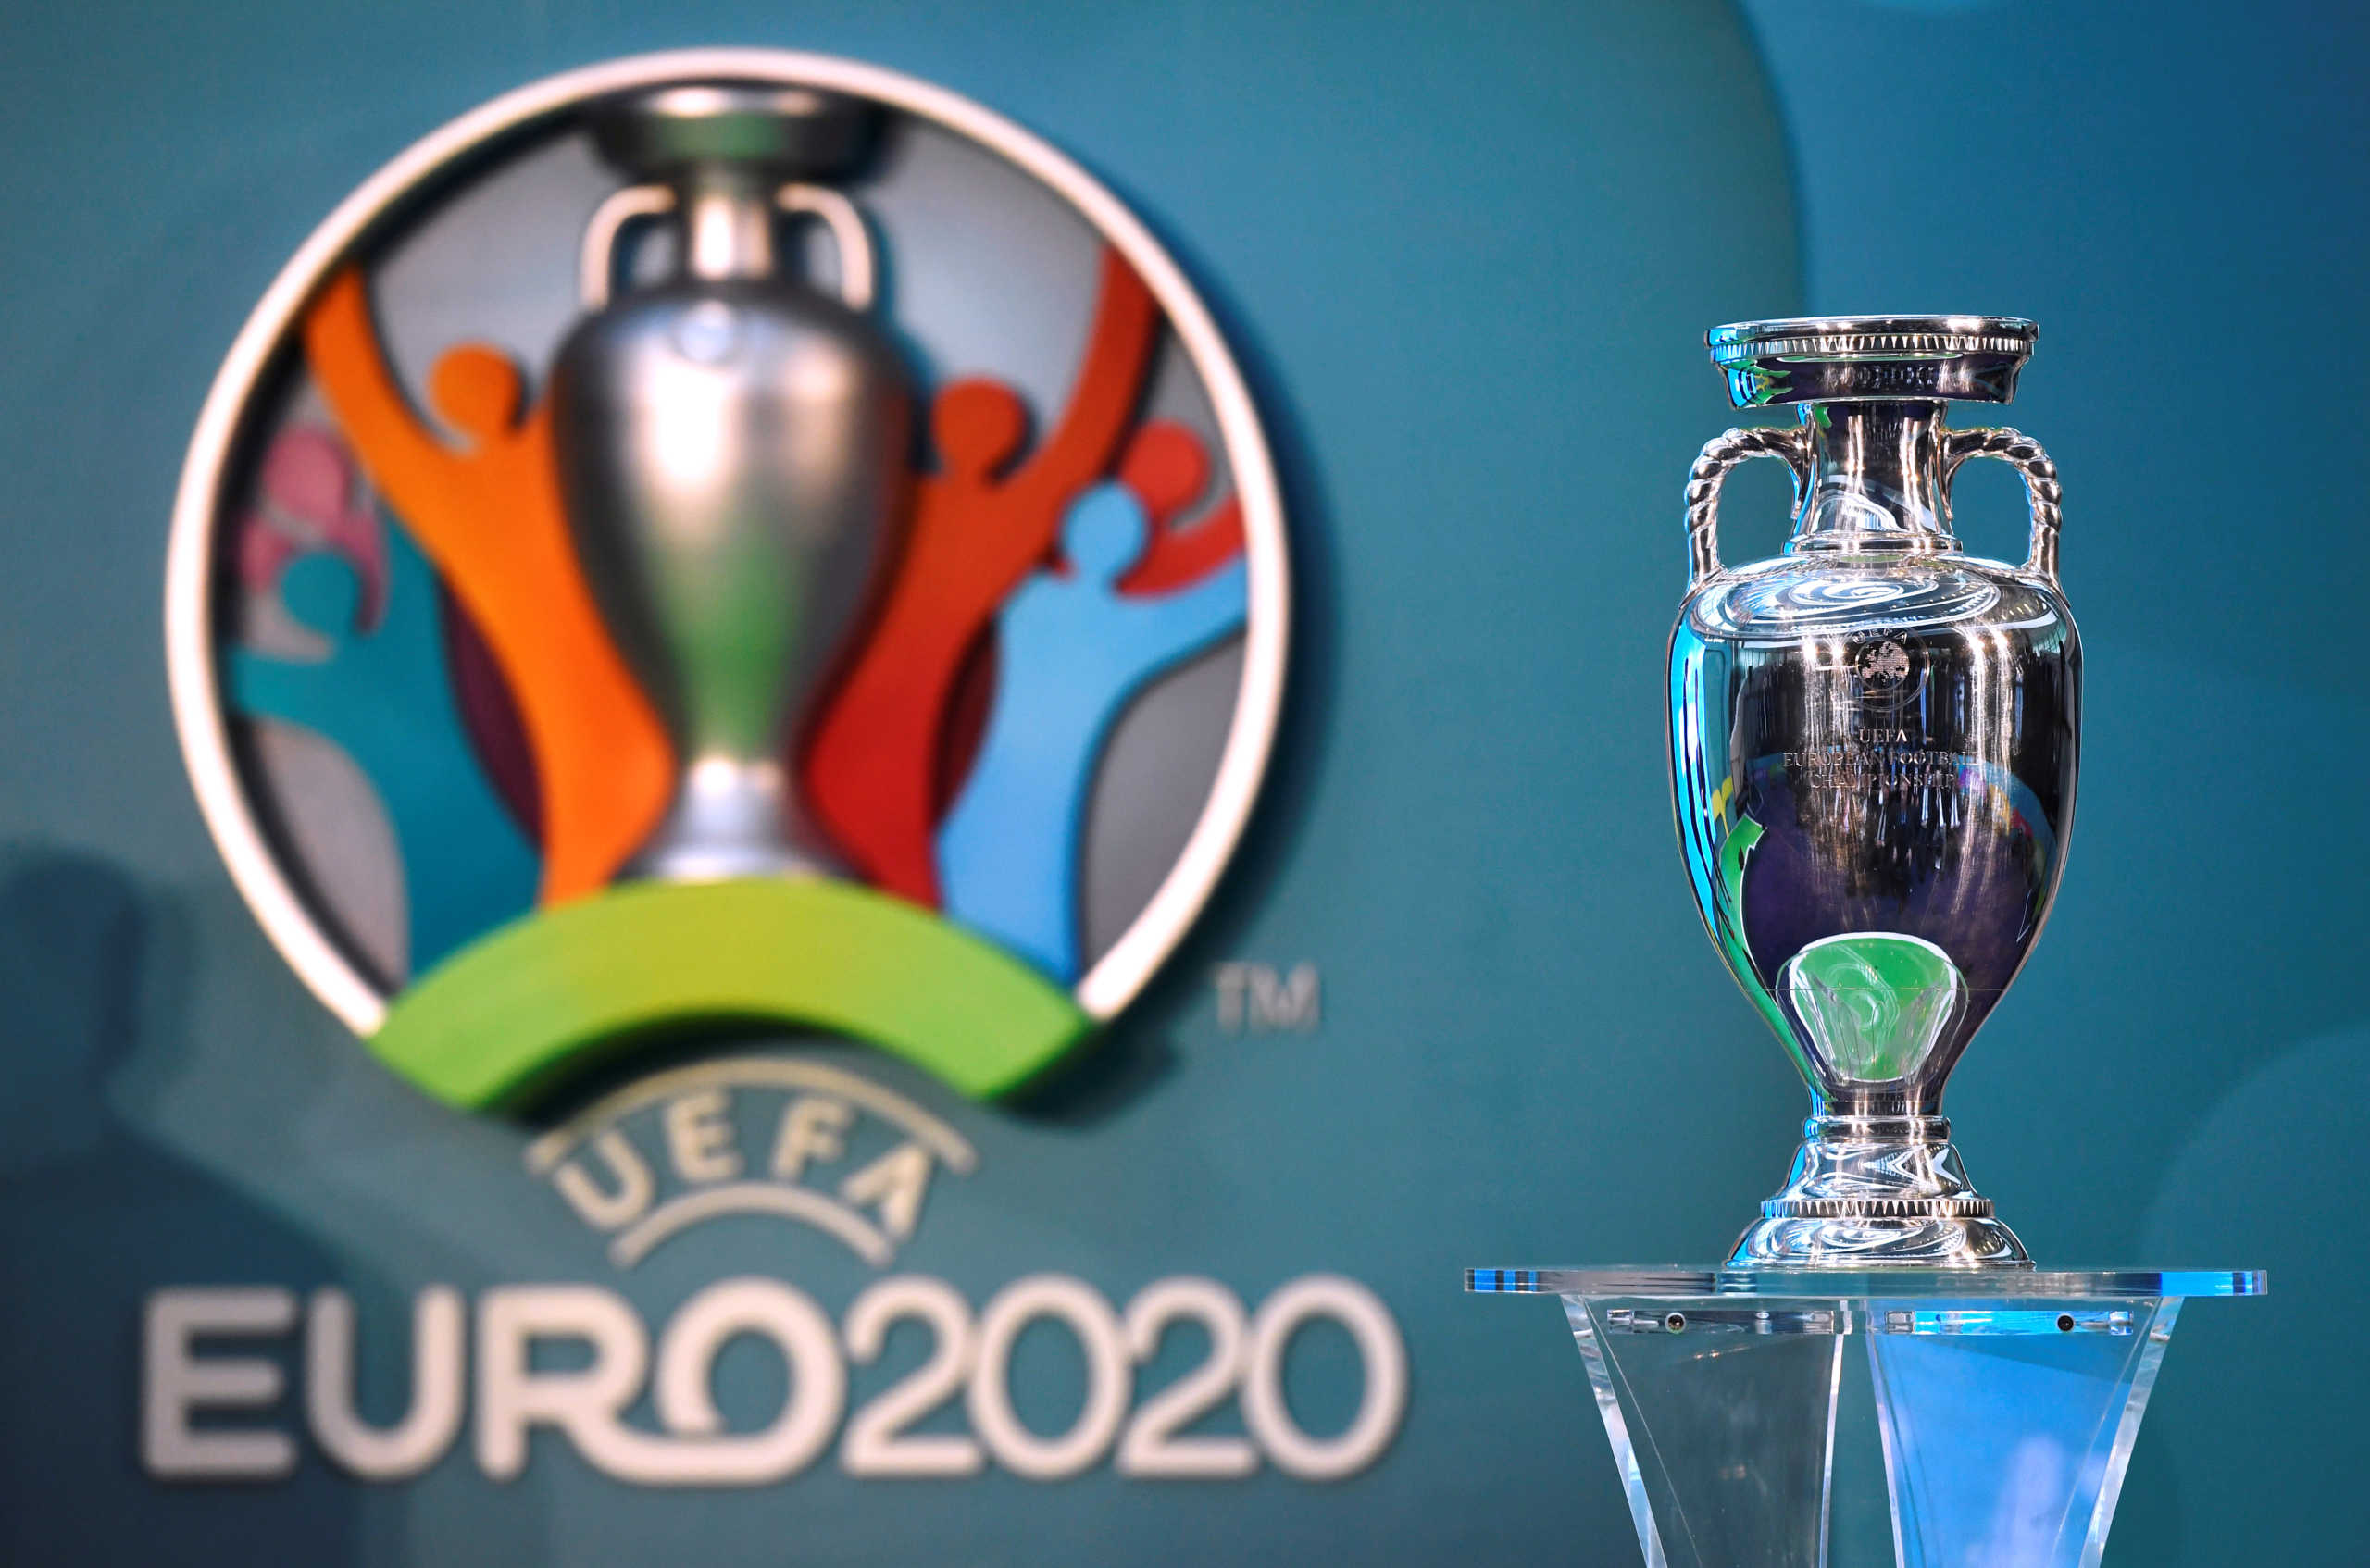 Euro 2020: Oι Ρουμάνοι επιτρέπουν 12.000 φιλάθλους στα παιχνίδια στο Βουκουρέστι